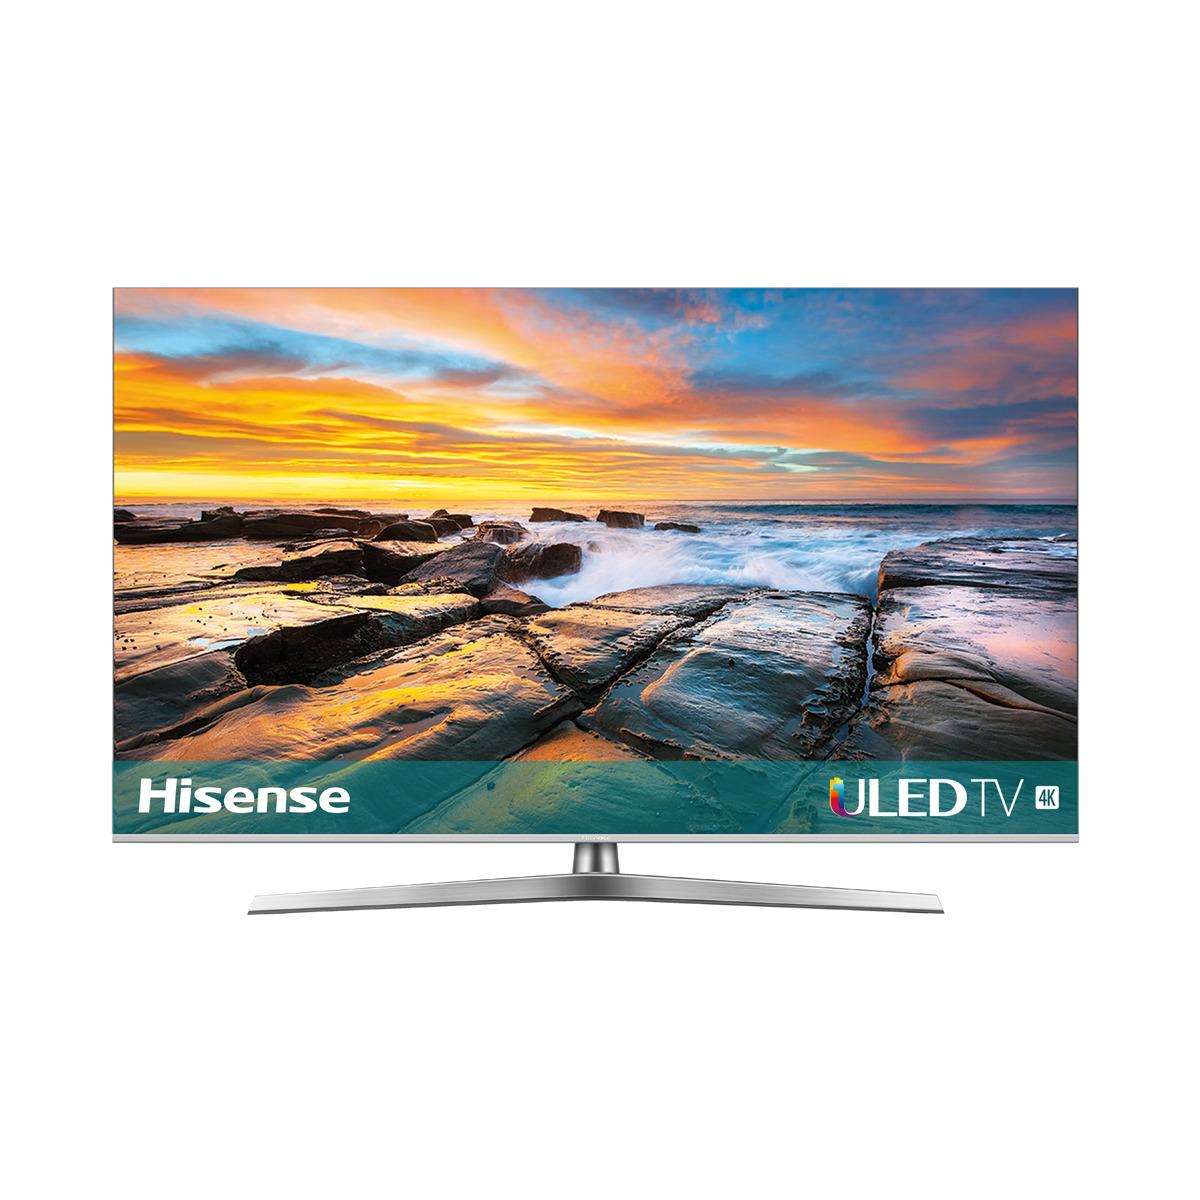 Televisor Hisense H50U7B 4K UHD ULED Smart TV